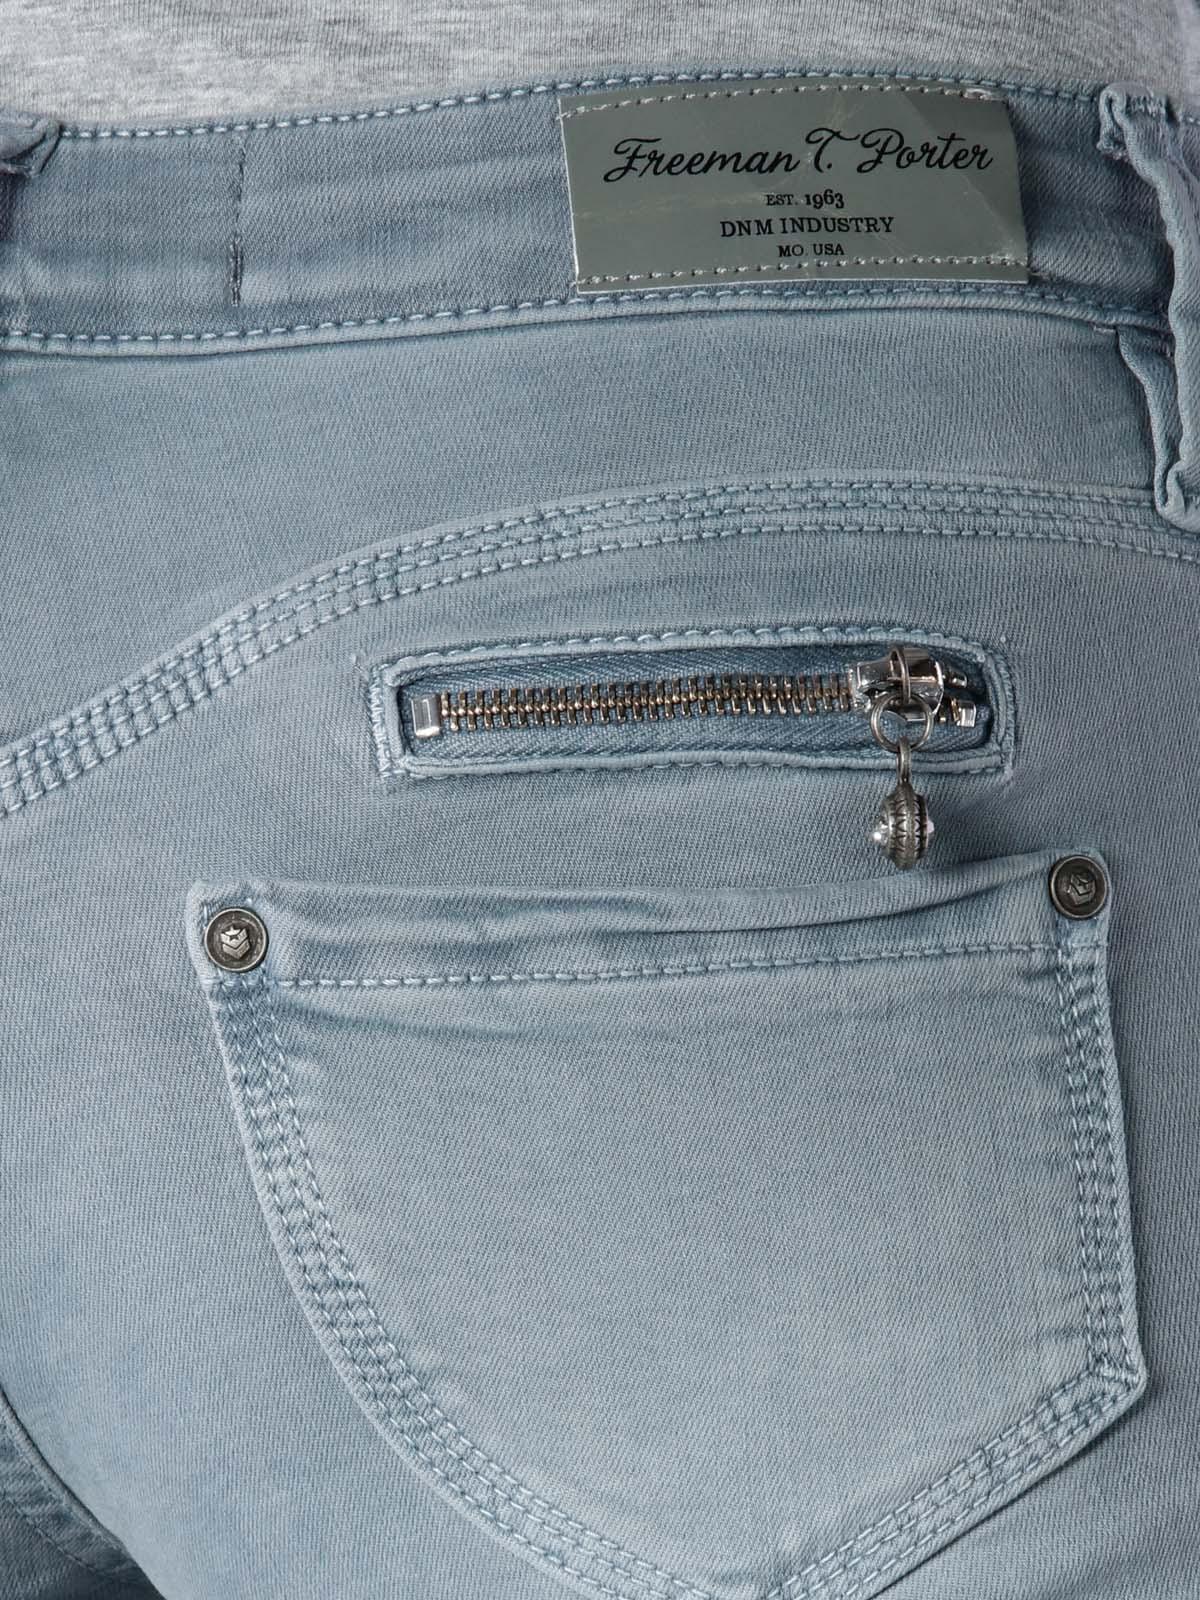 popular brand amazing price the cheapest Freeman T Porter Alexa Jeans Slim New Magic gargoyle XS